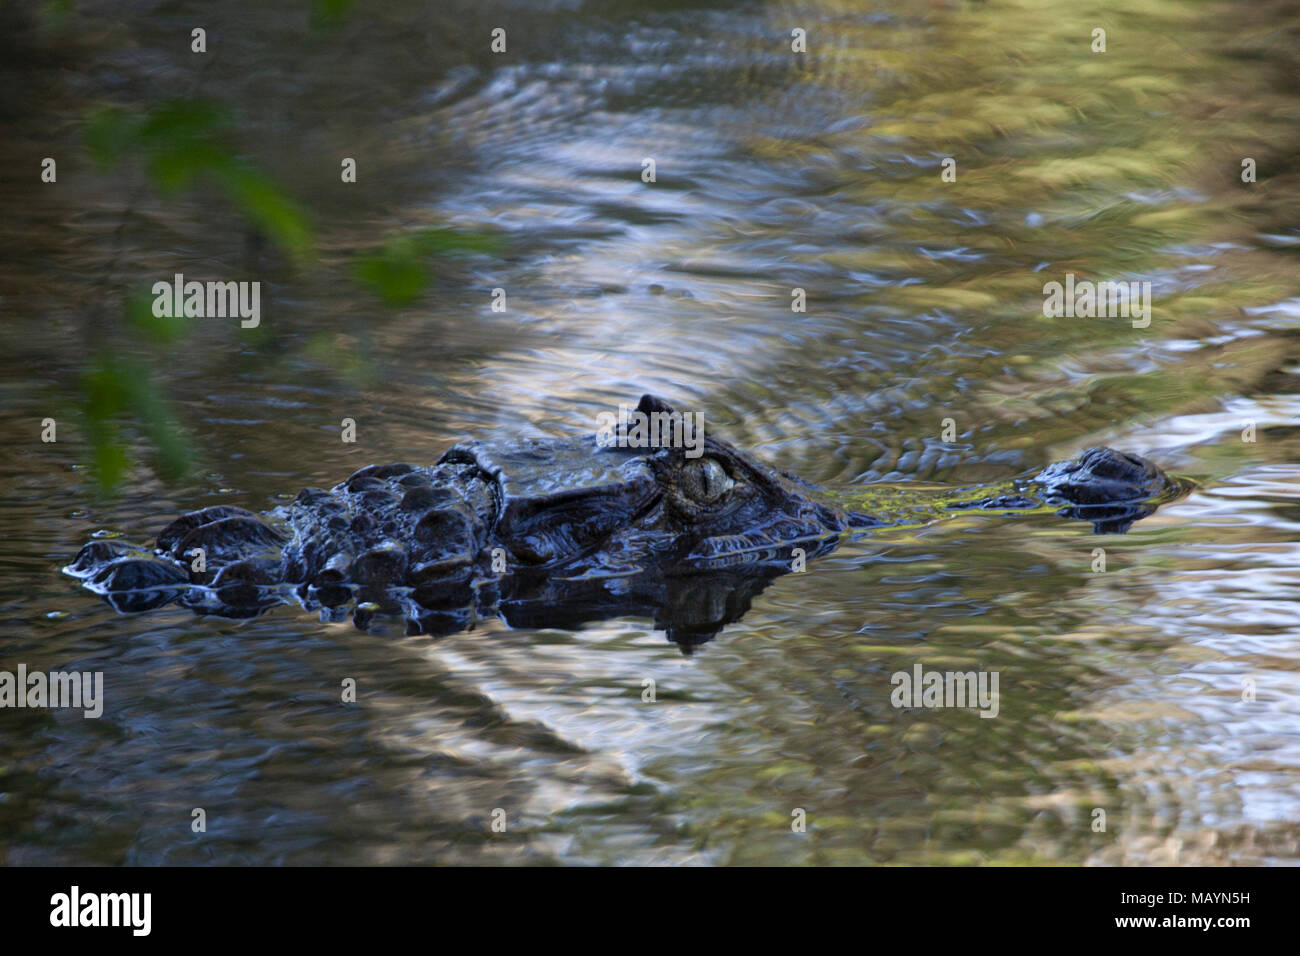 American crocodile (Crocodylus acutus) - Stock Image